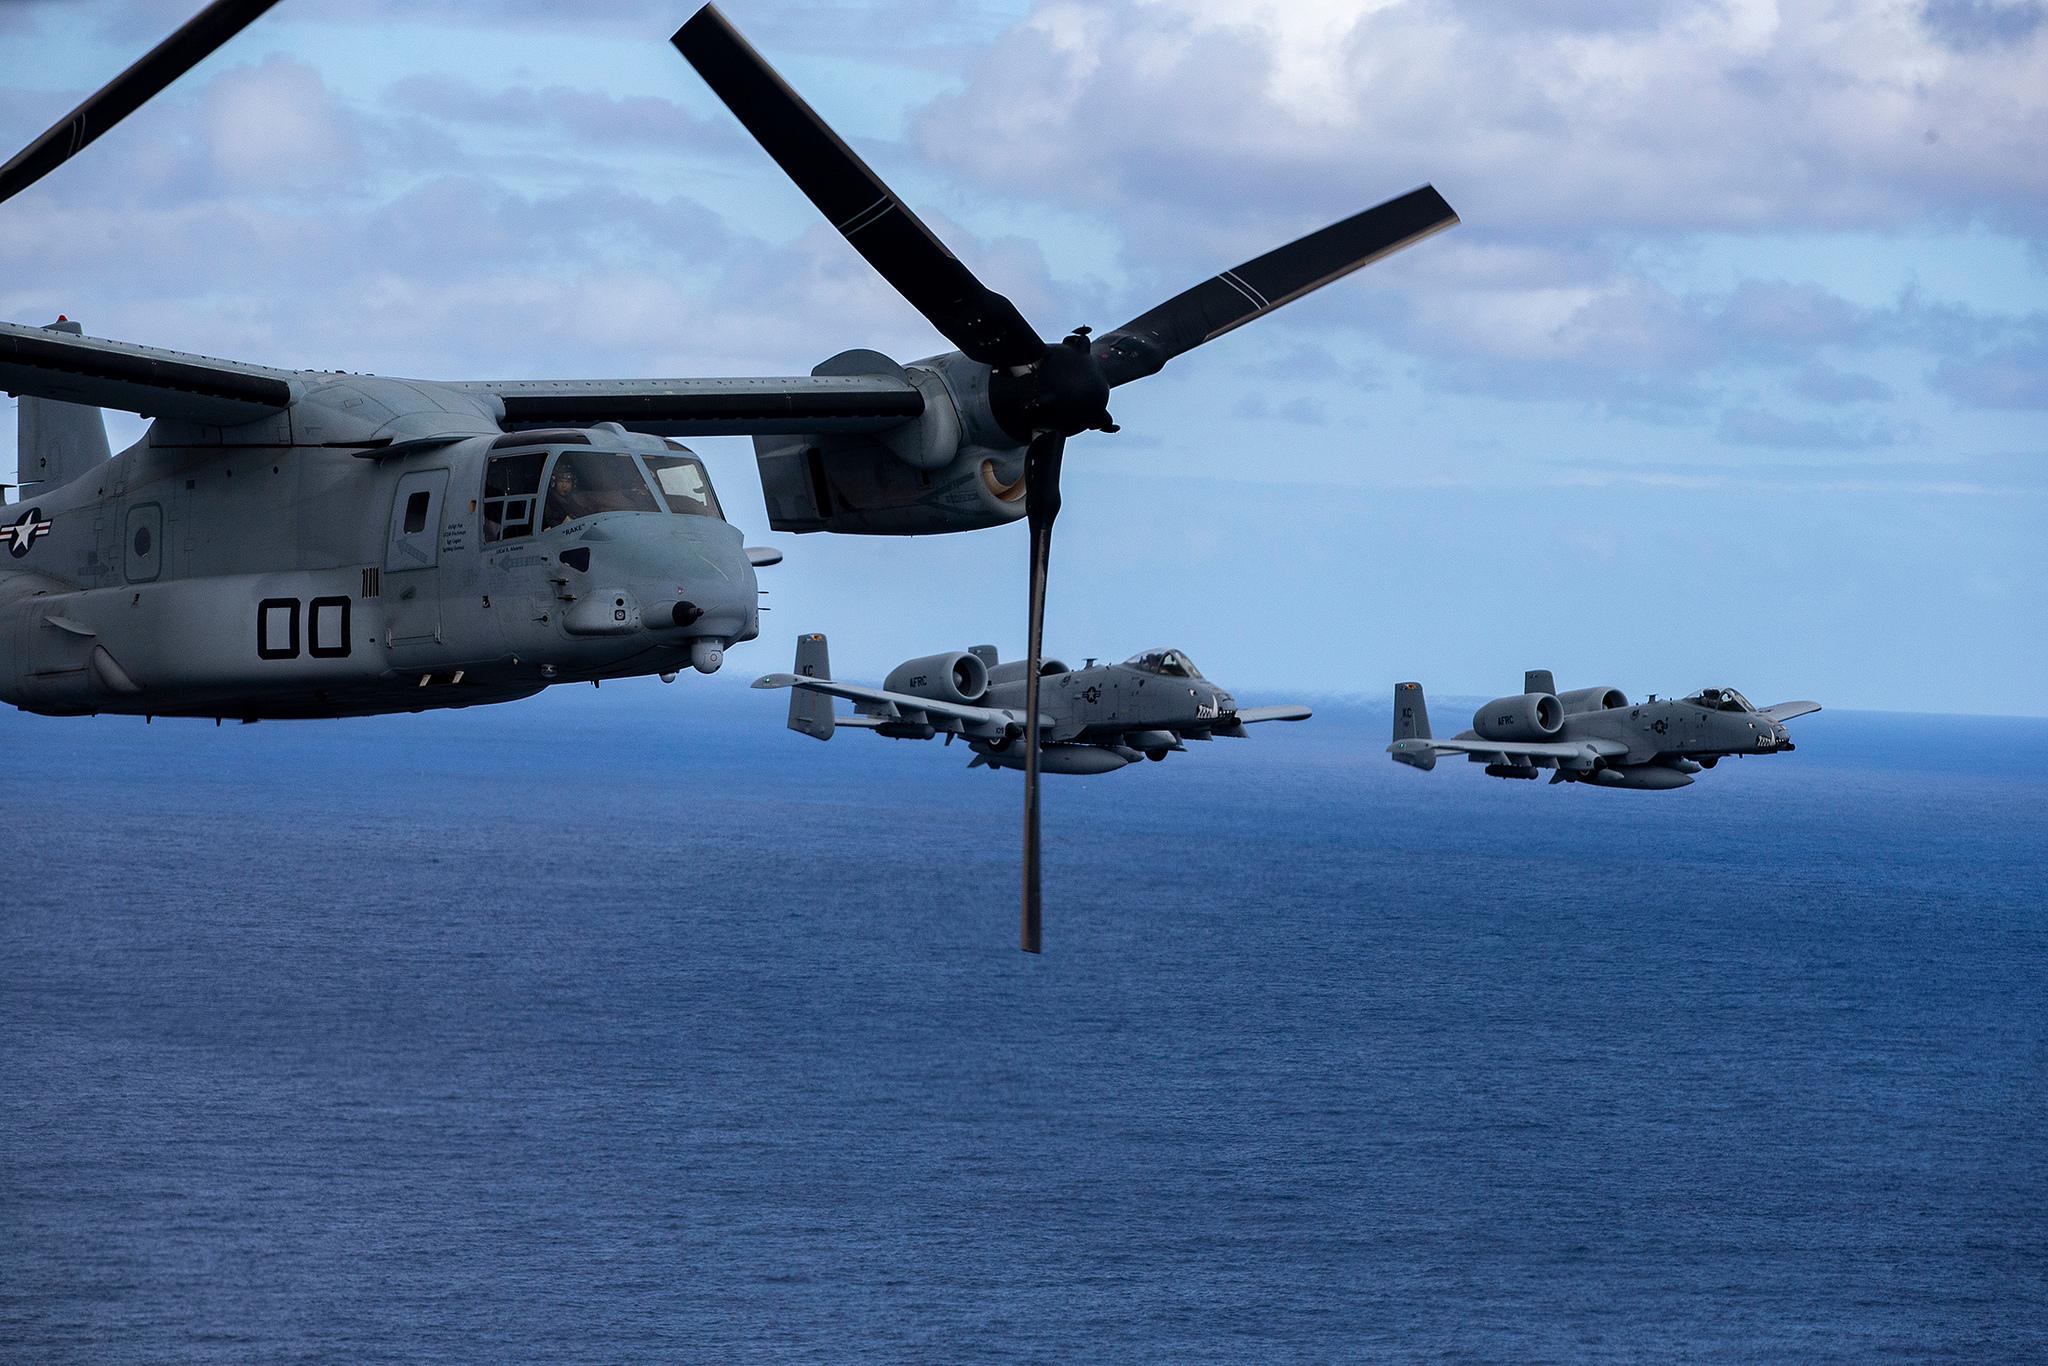 Air Force A-10 Thunderbolt II aircraft escort an MV-22B Osprey in Hawaii on Feb. 26, 2019. (Sgt. Alex Kouns/Marine Corps)